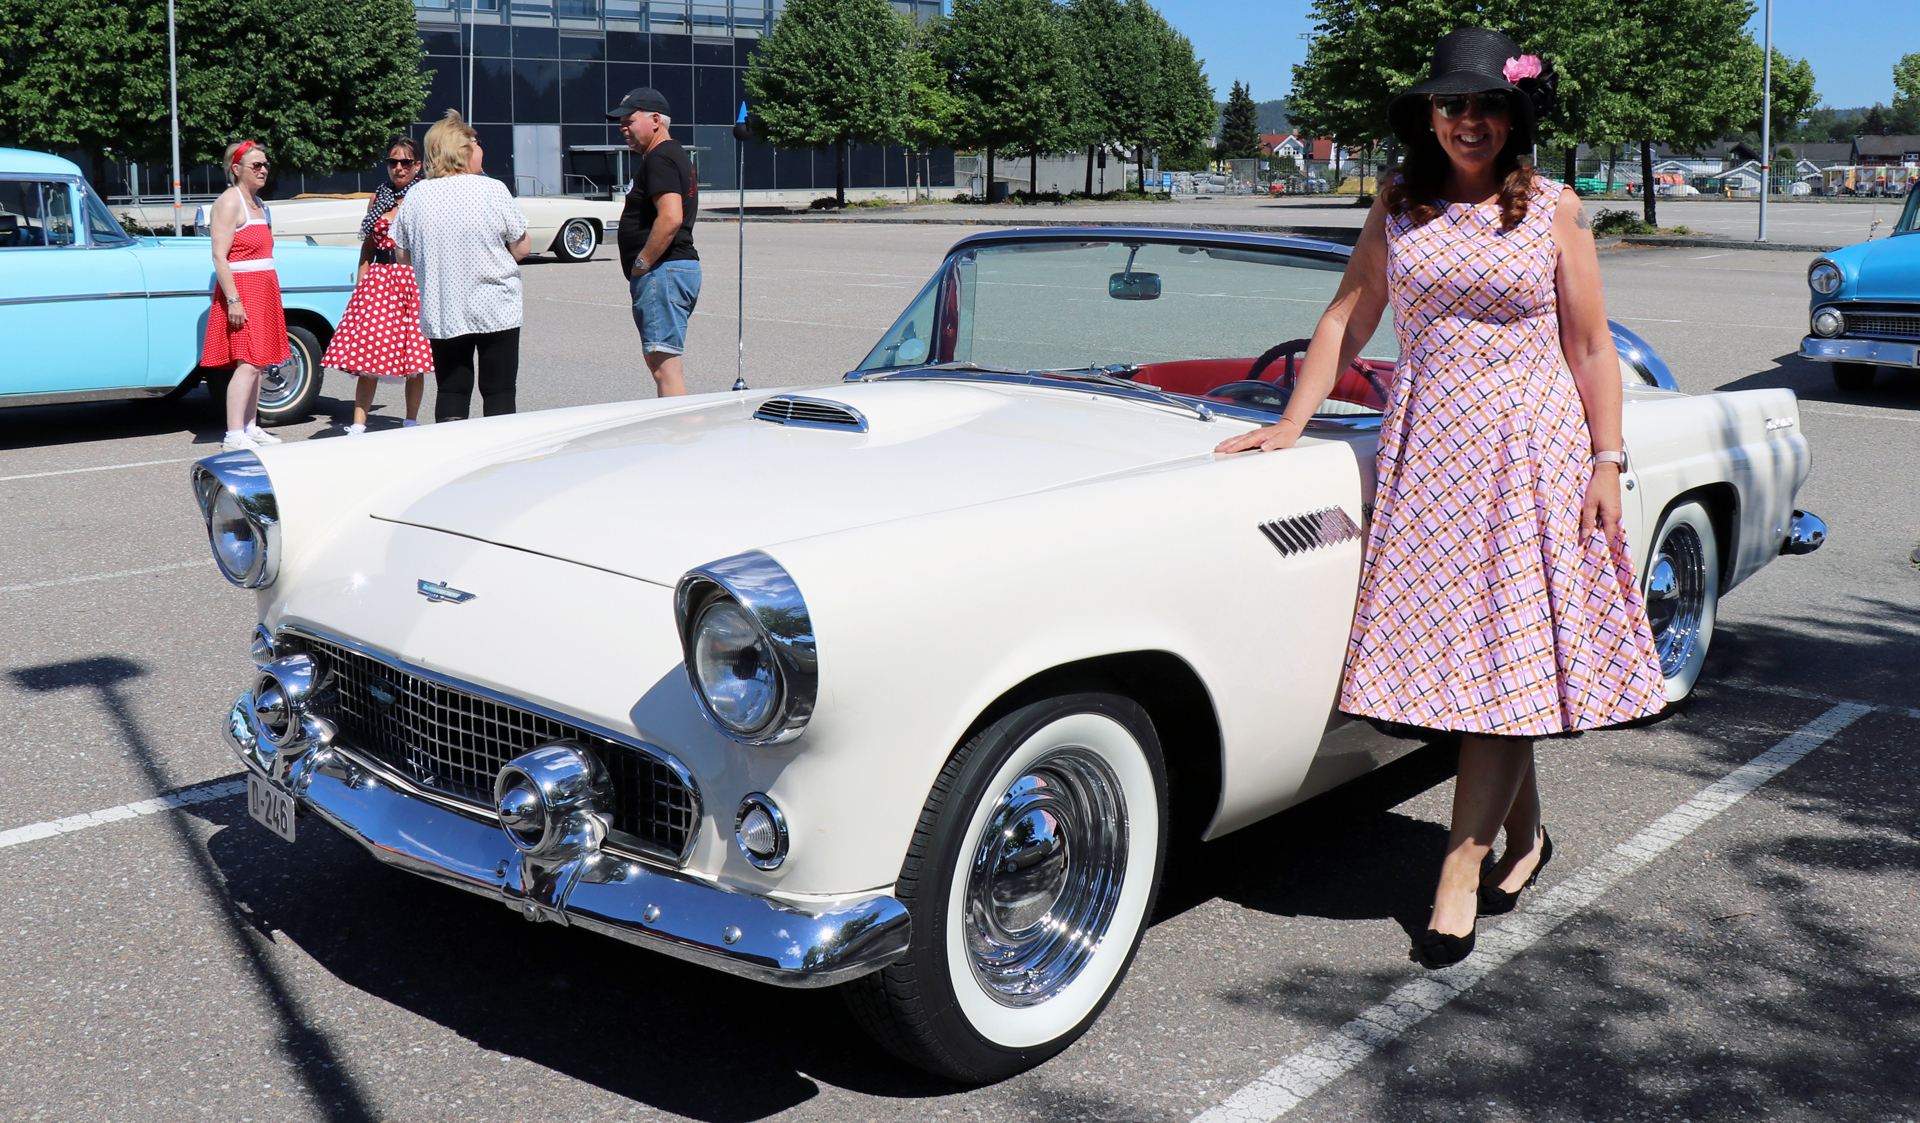 350-1956 Ford Thunderbird 02. Eiere- medlem 350 Ju